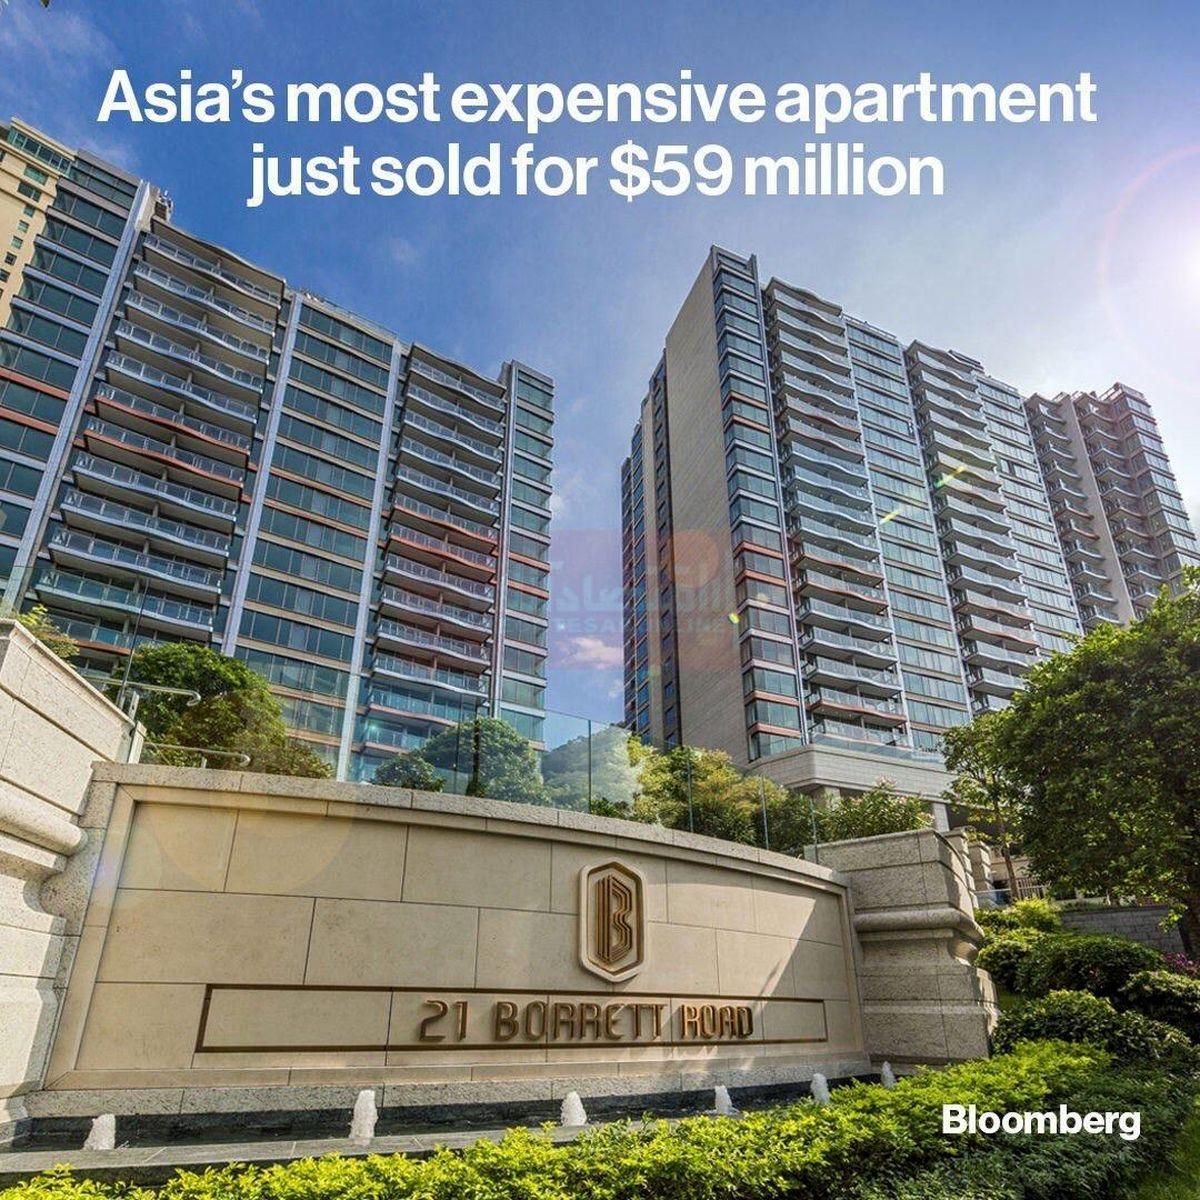 گرانترین آپارتمان آسیا +عکس